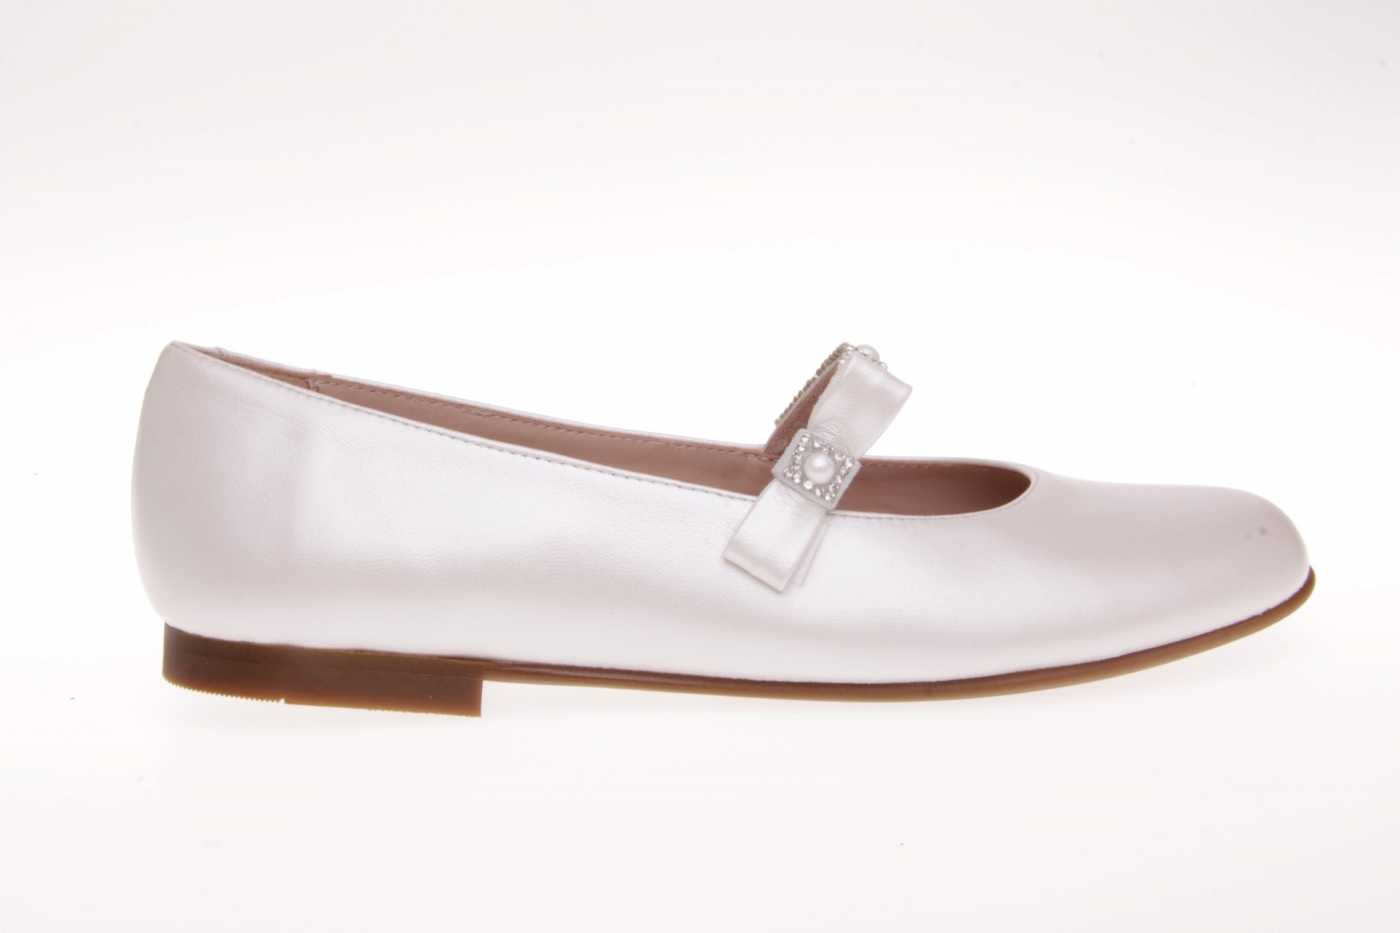 19df37e782c Comprar zapato tipo joven niÑa estilo mercedes color beige piel jpg  1400x933 Zapatos primera comunion